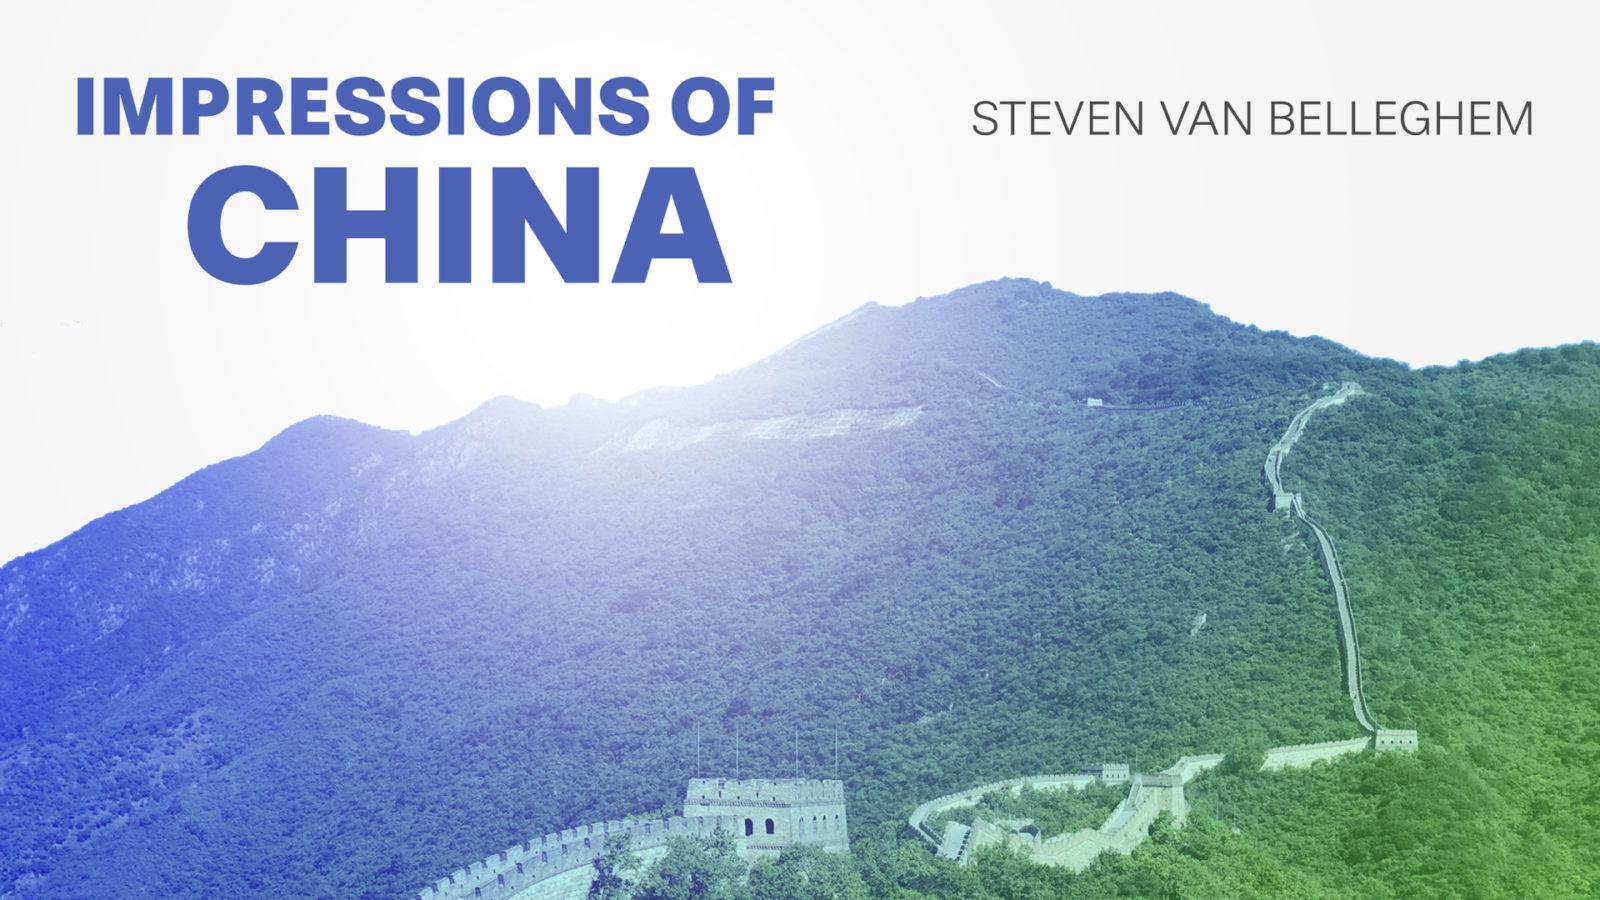 2019_0507_China-introduction_steven.001-1600x900.jpg